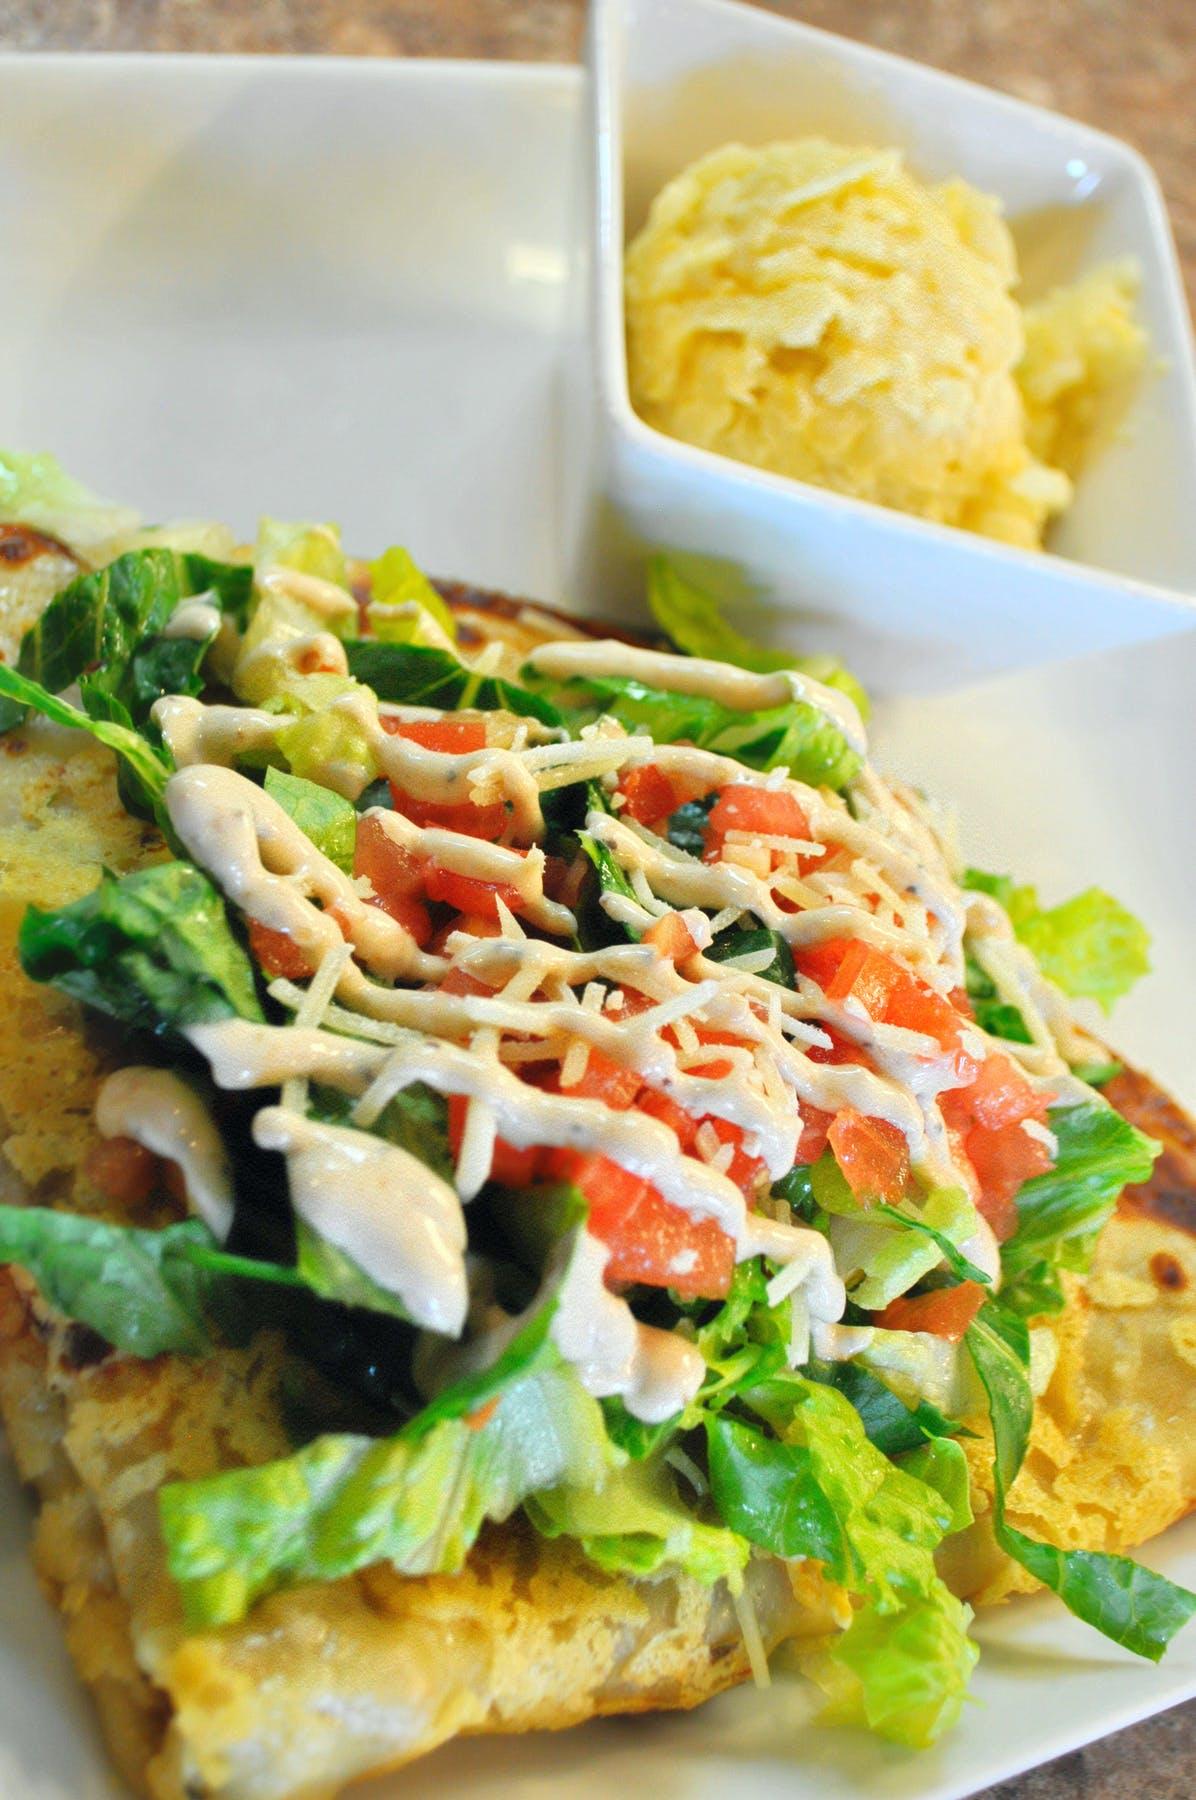 a savory crepe and potatoes on a plate